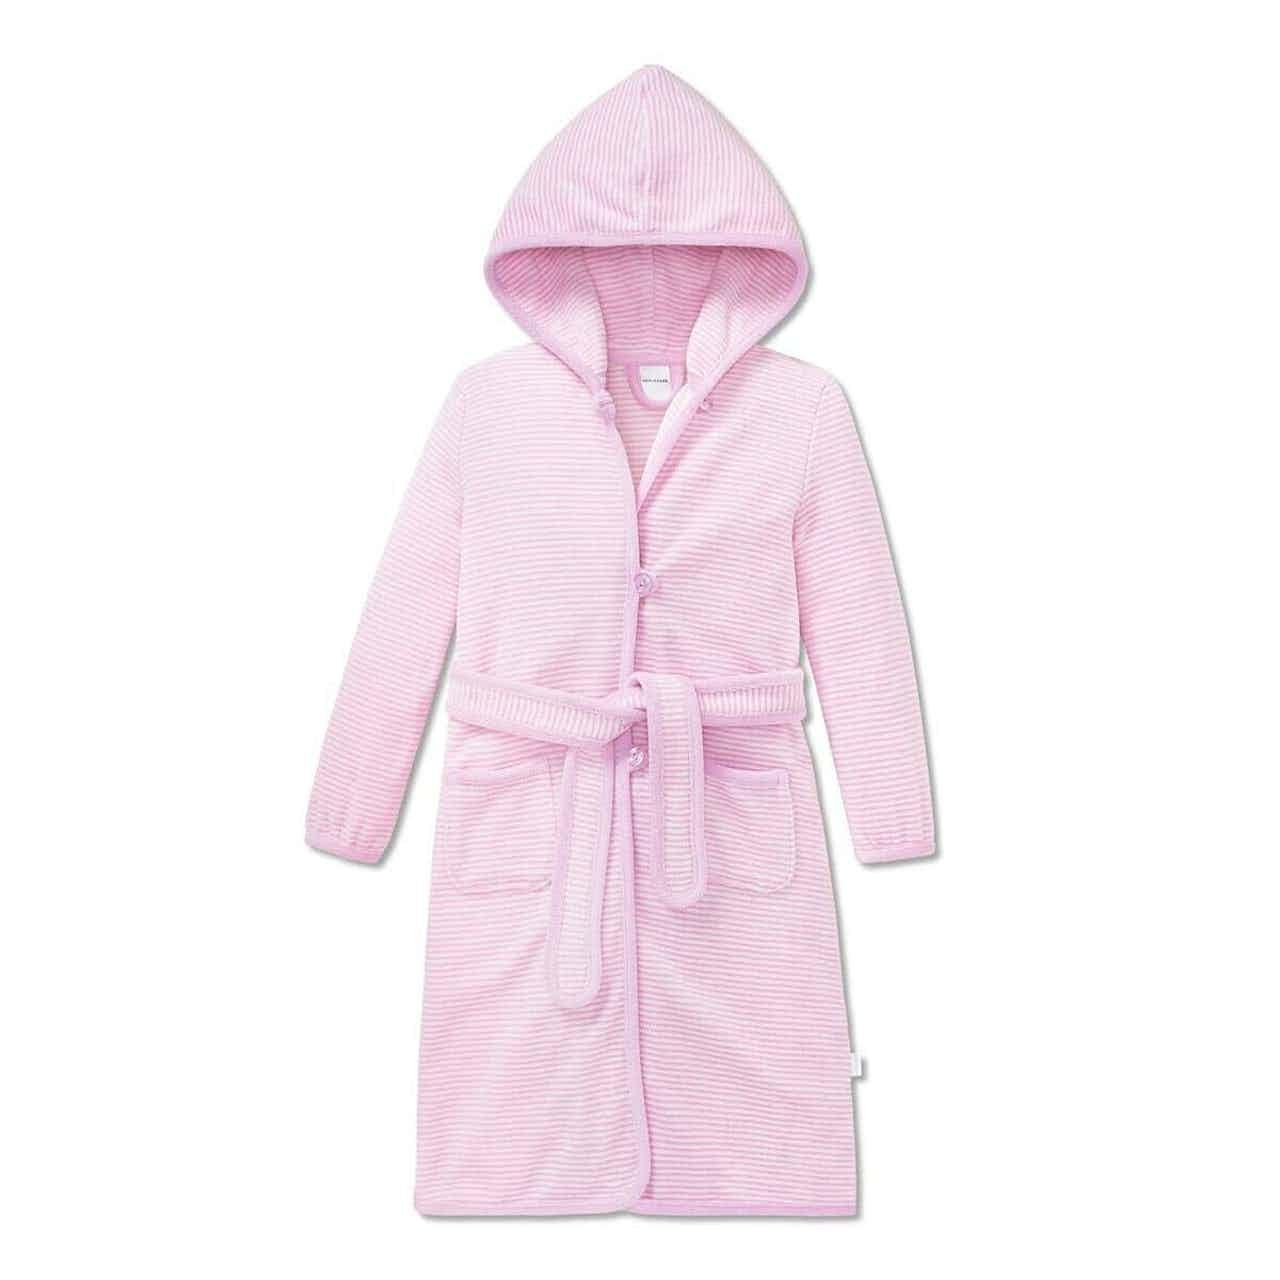 Schiesser Kinder Kapuzenmantel Uni rosa